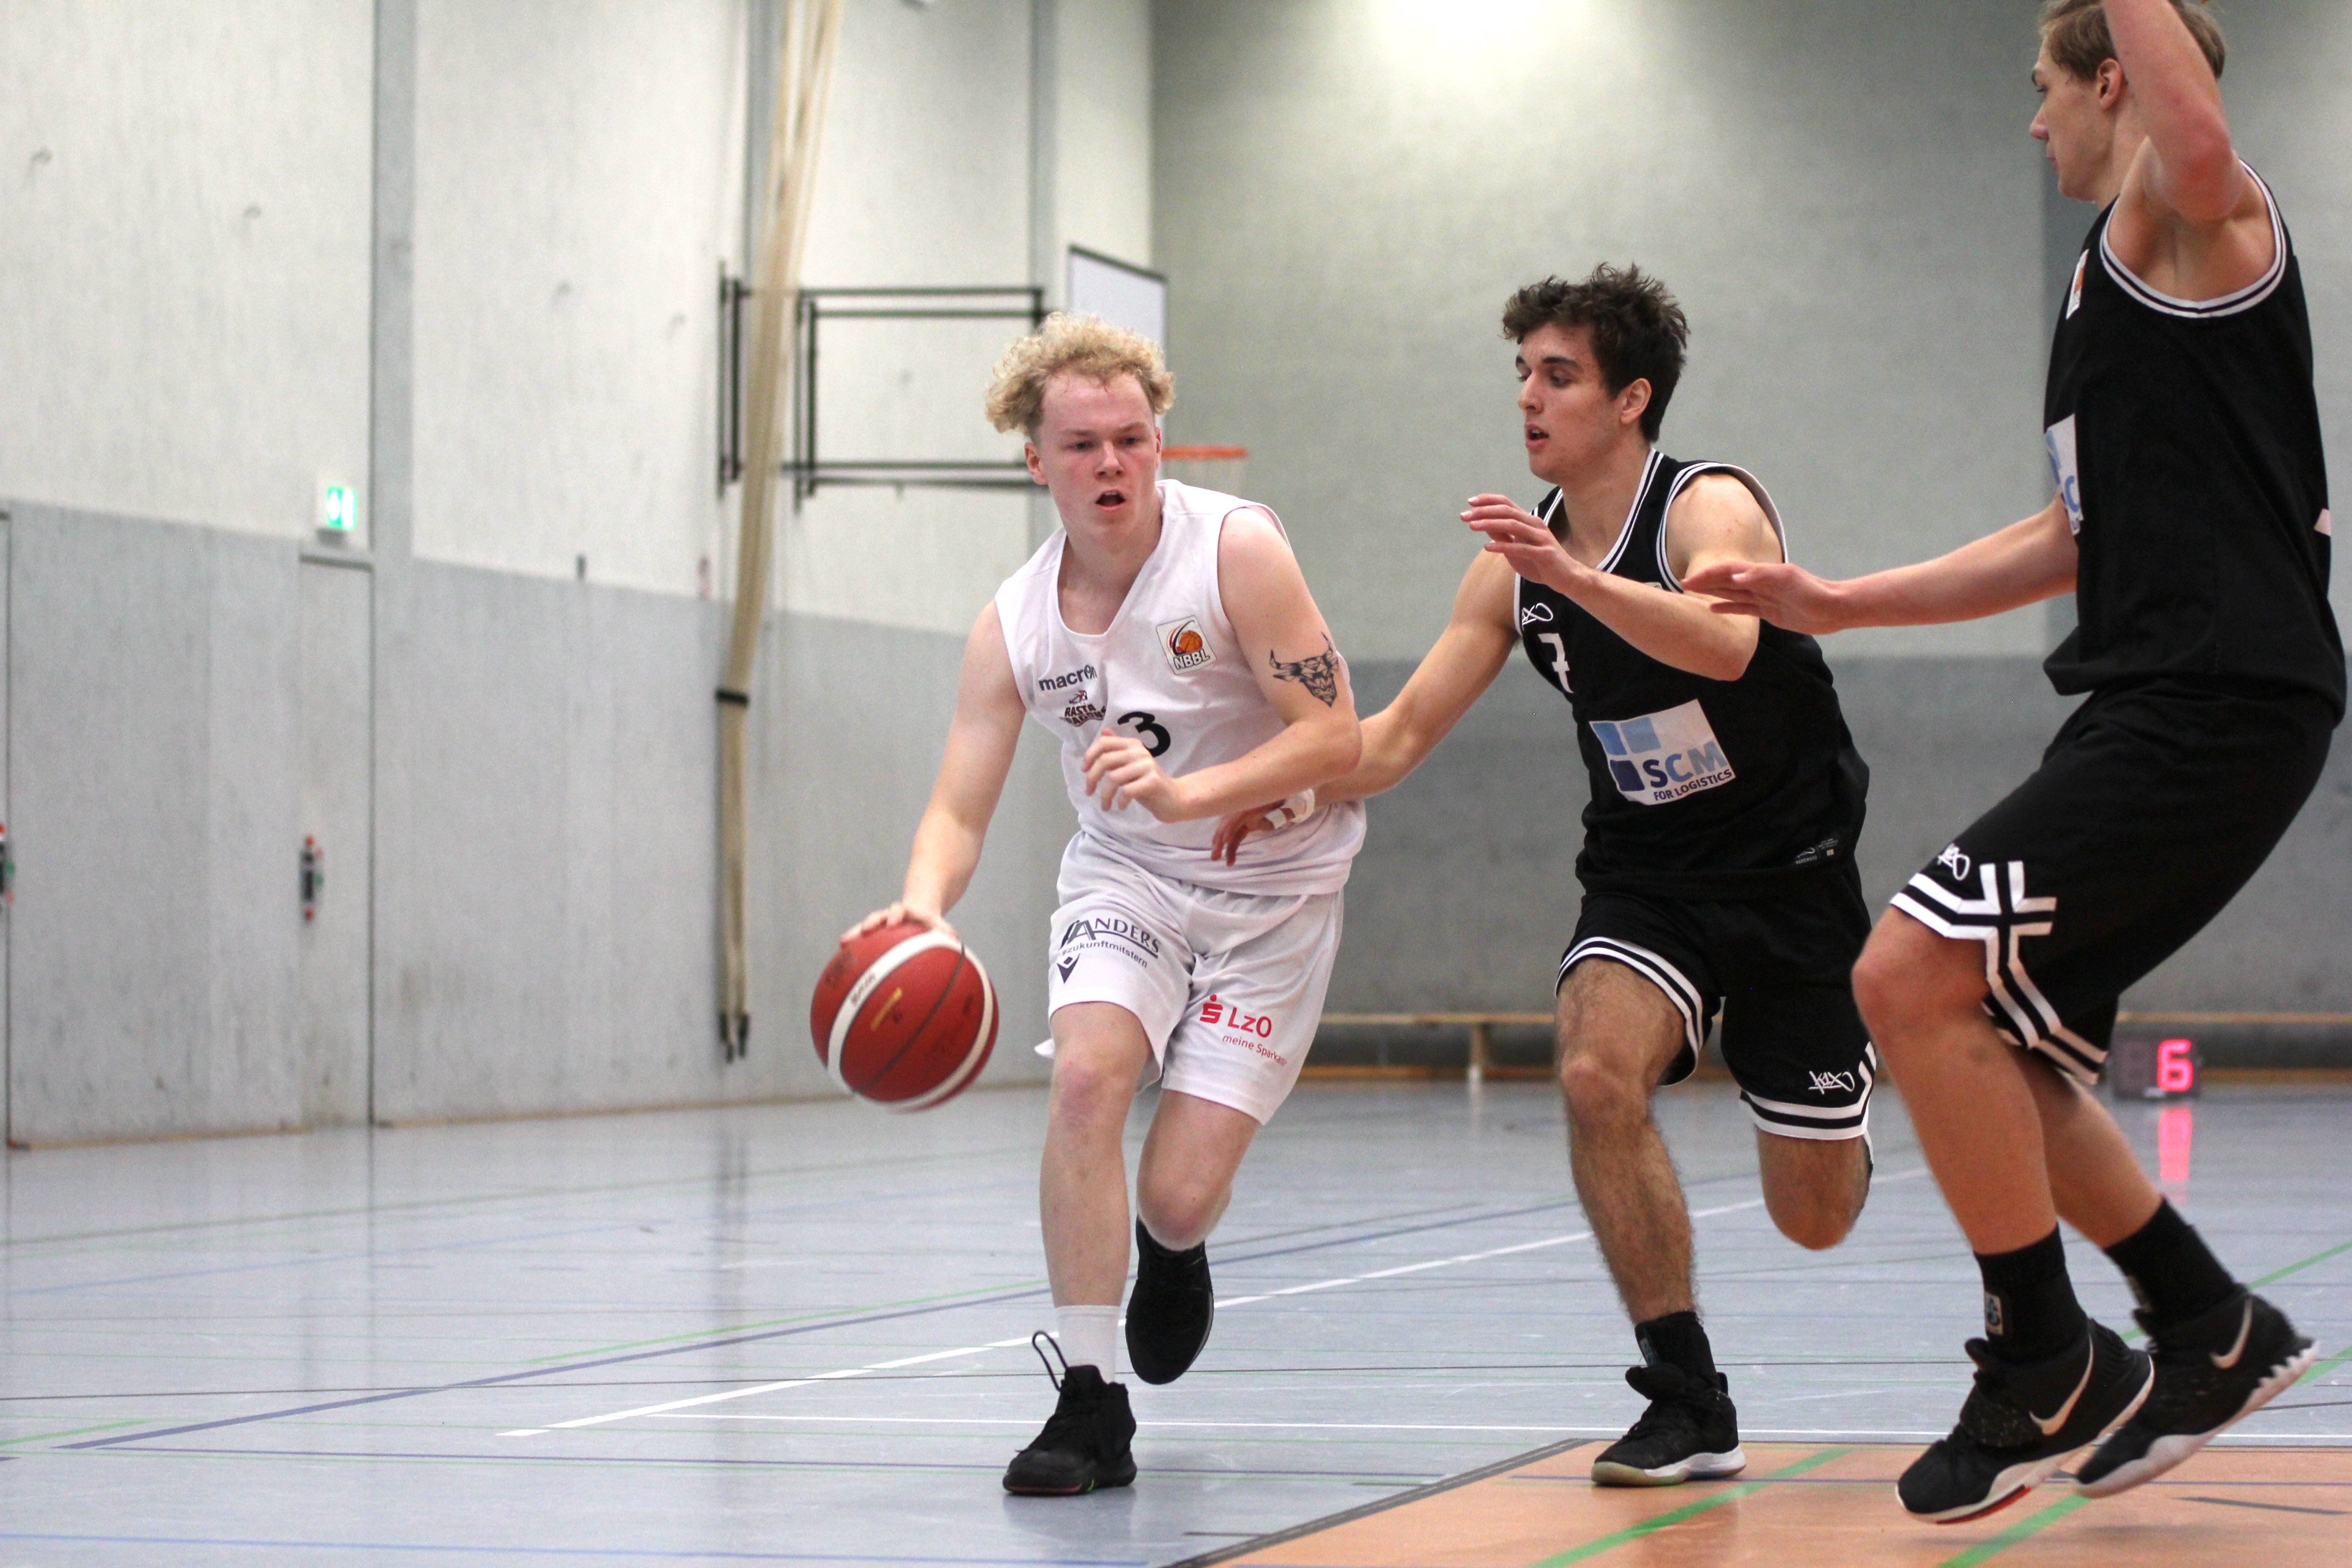 NBBL_20-21_YOUNG-RASTA-DRAGONS_Münster_Spieltag1_Jonny-Willen_4